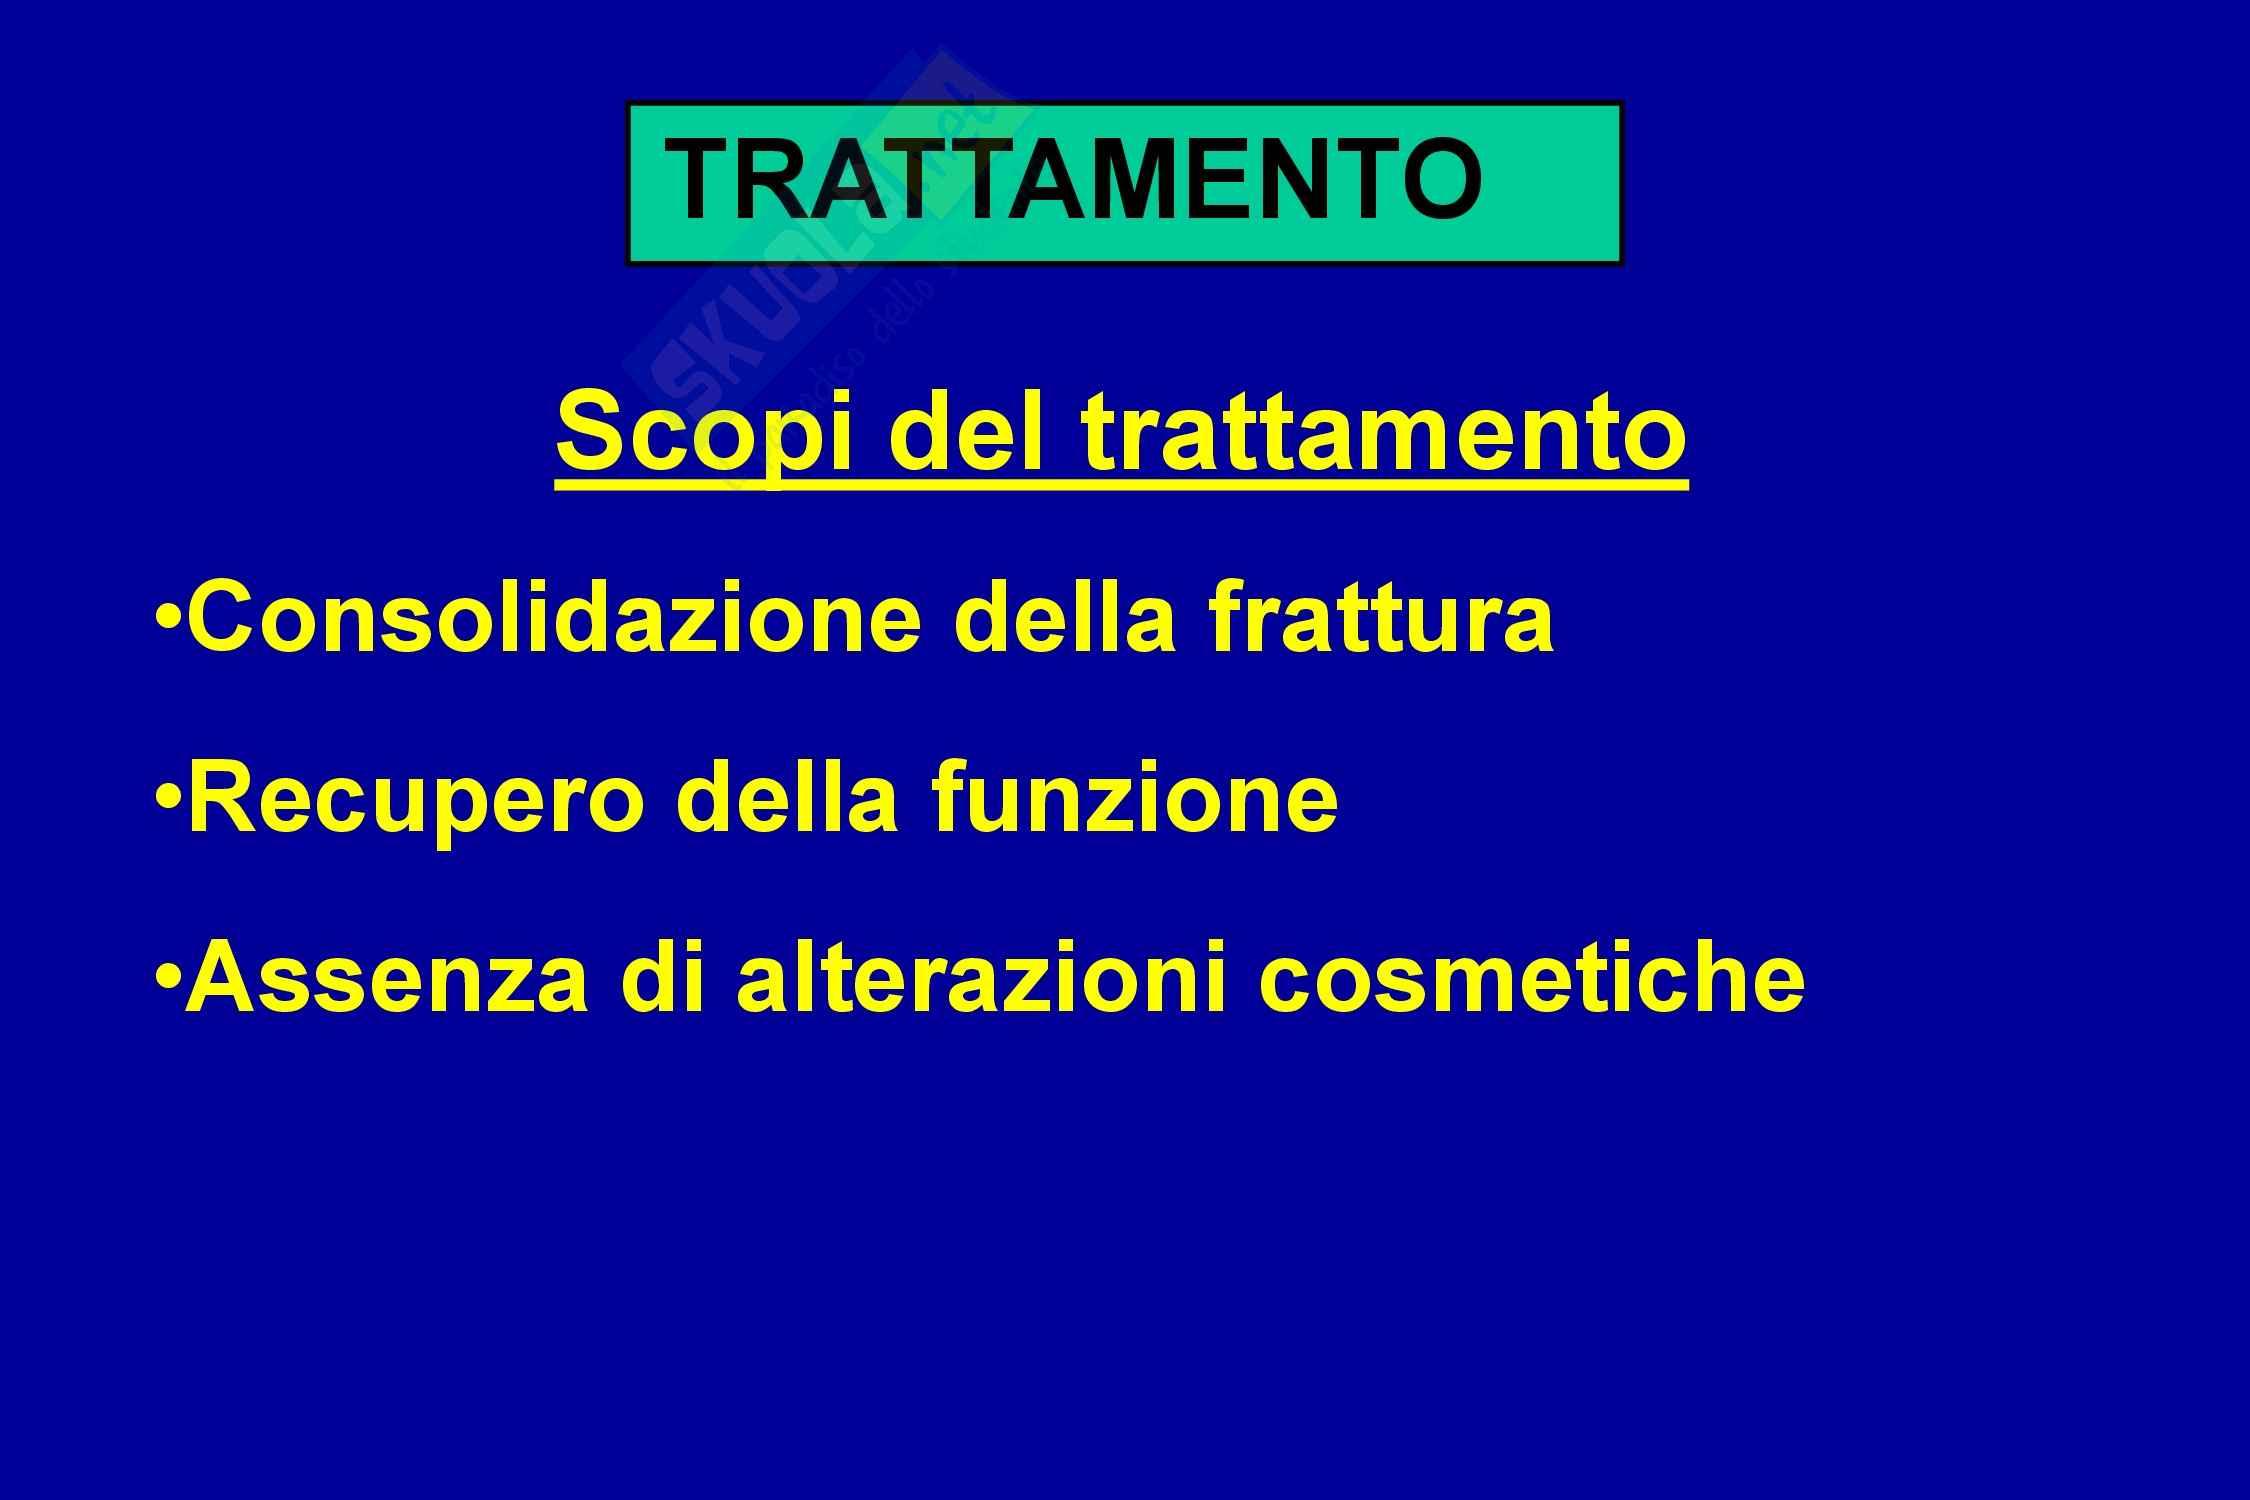 Ortopedia - Fratture Pag. 46